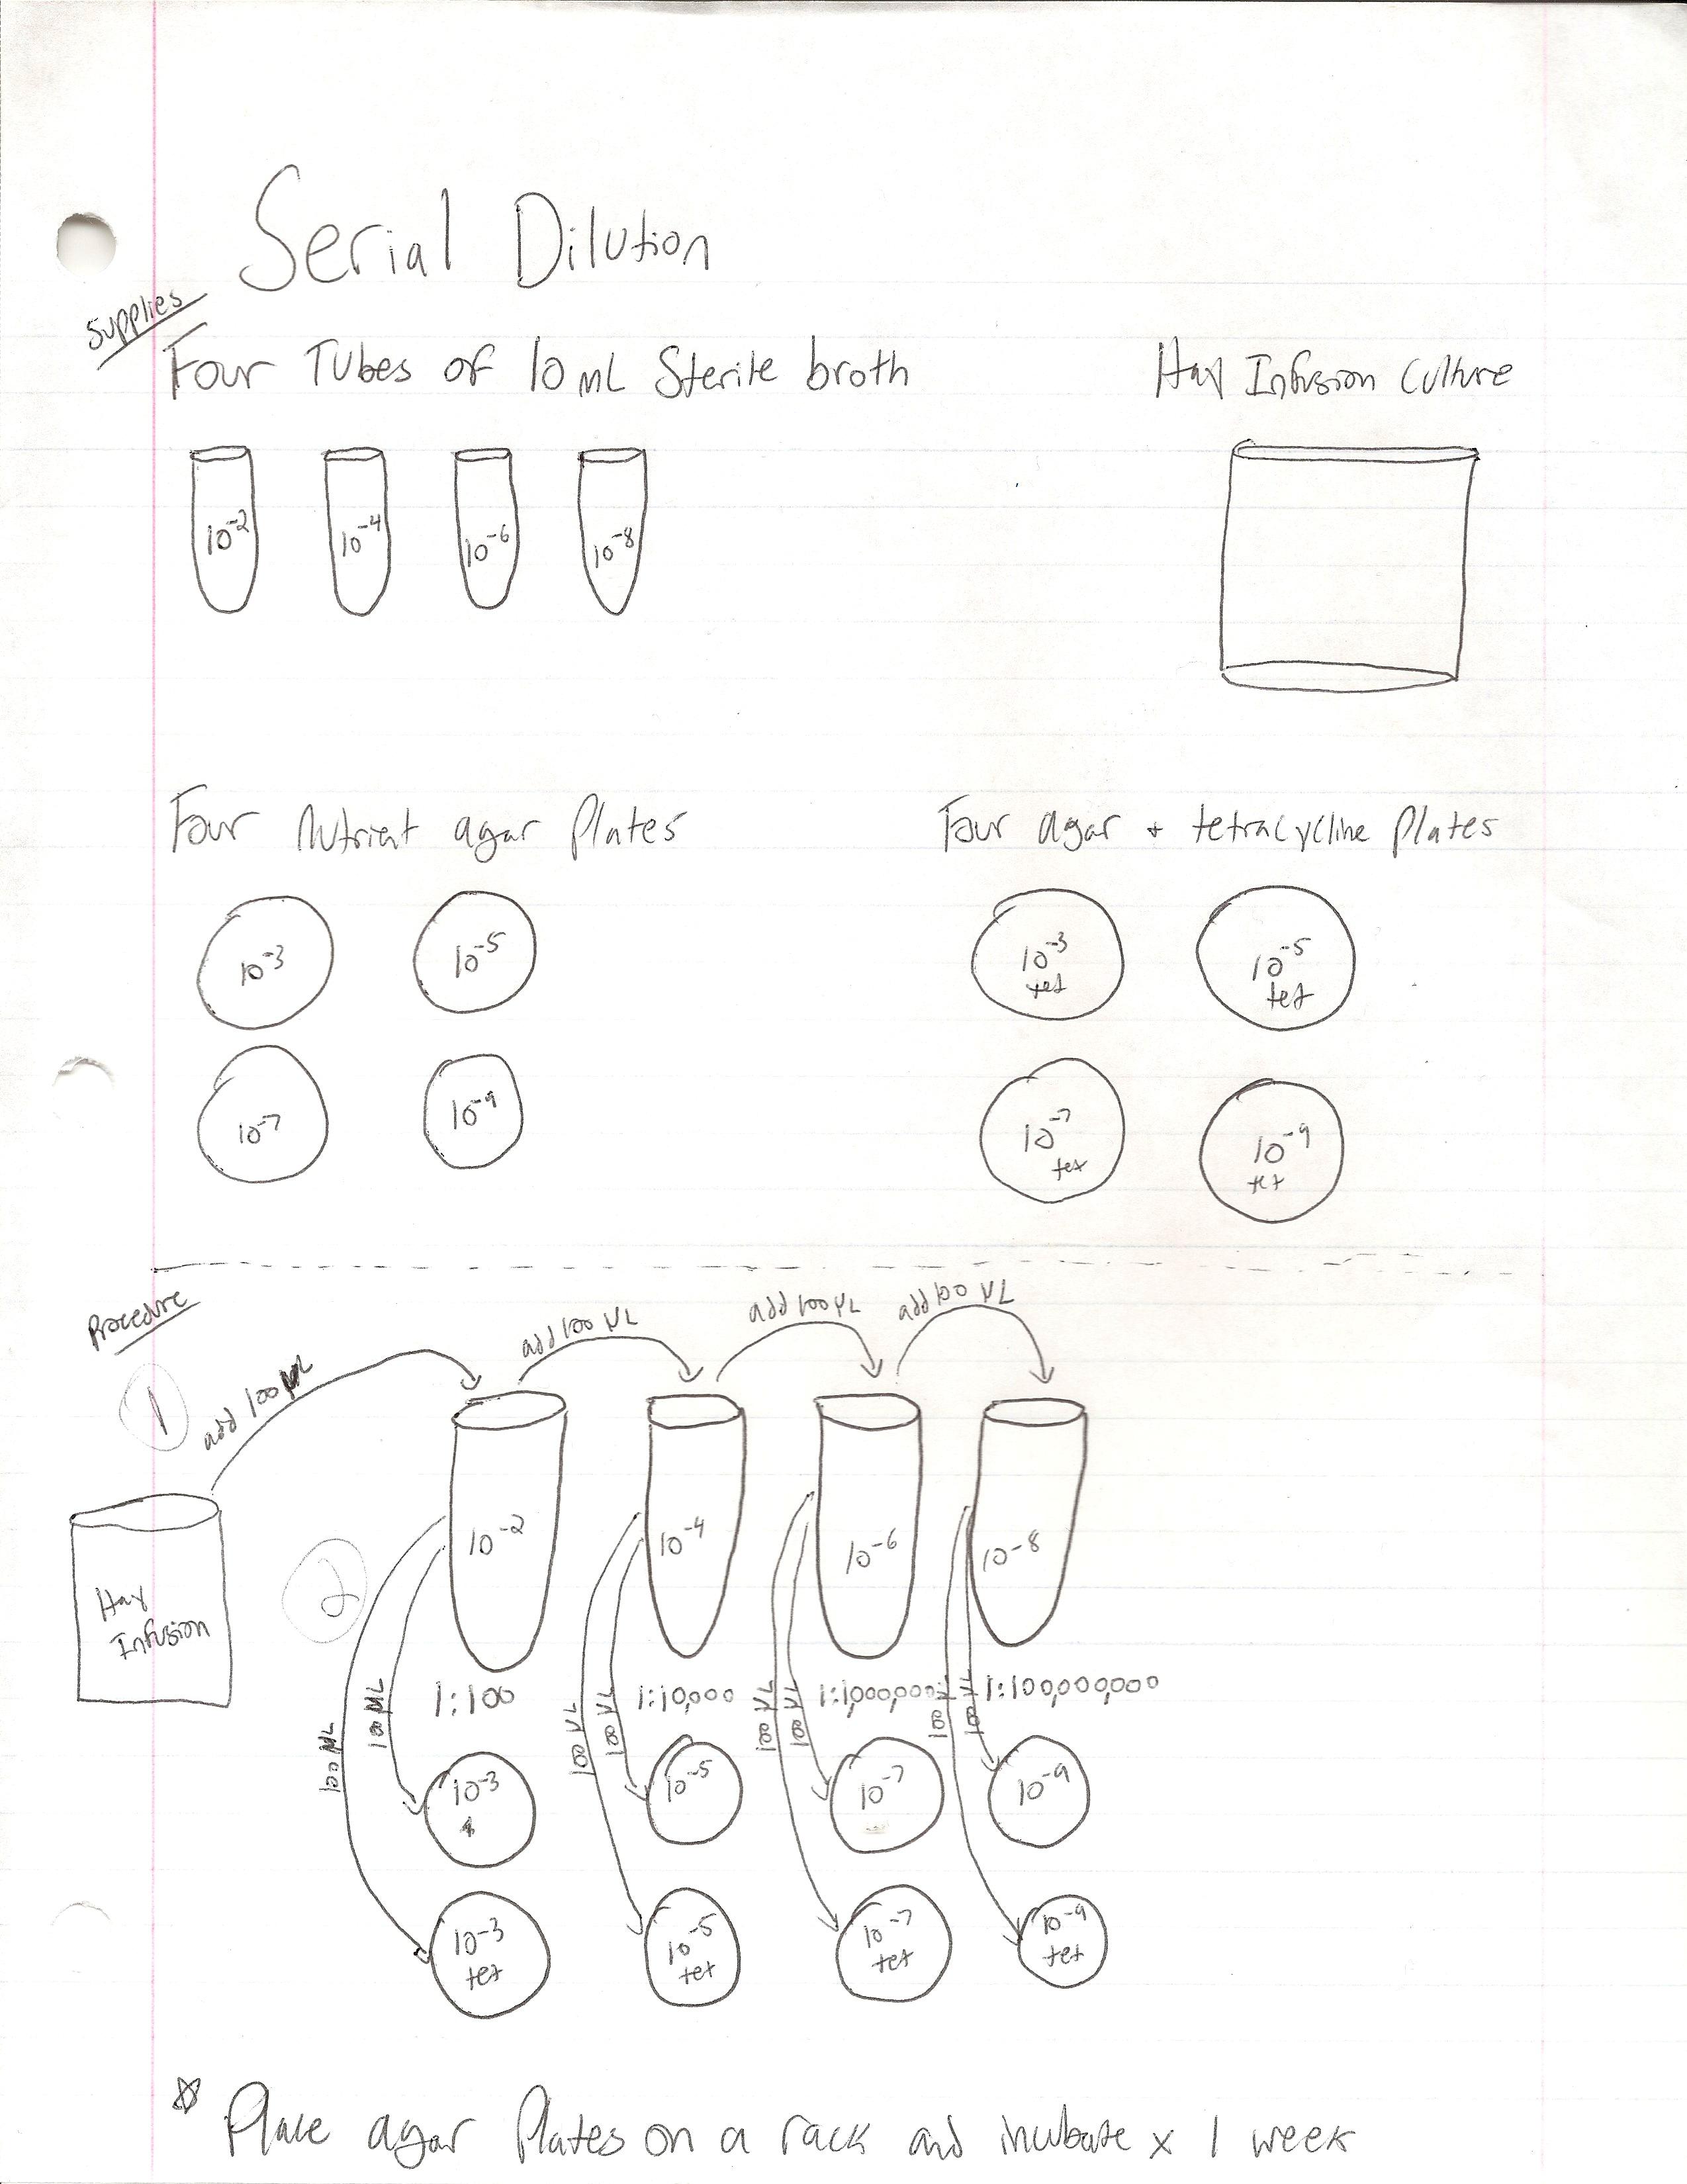 Serial dilution diagram.jpg